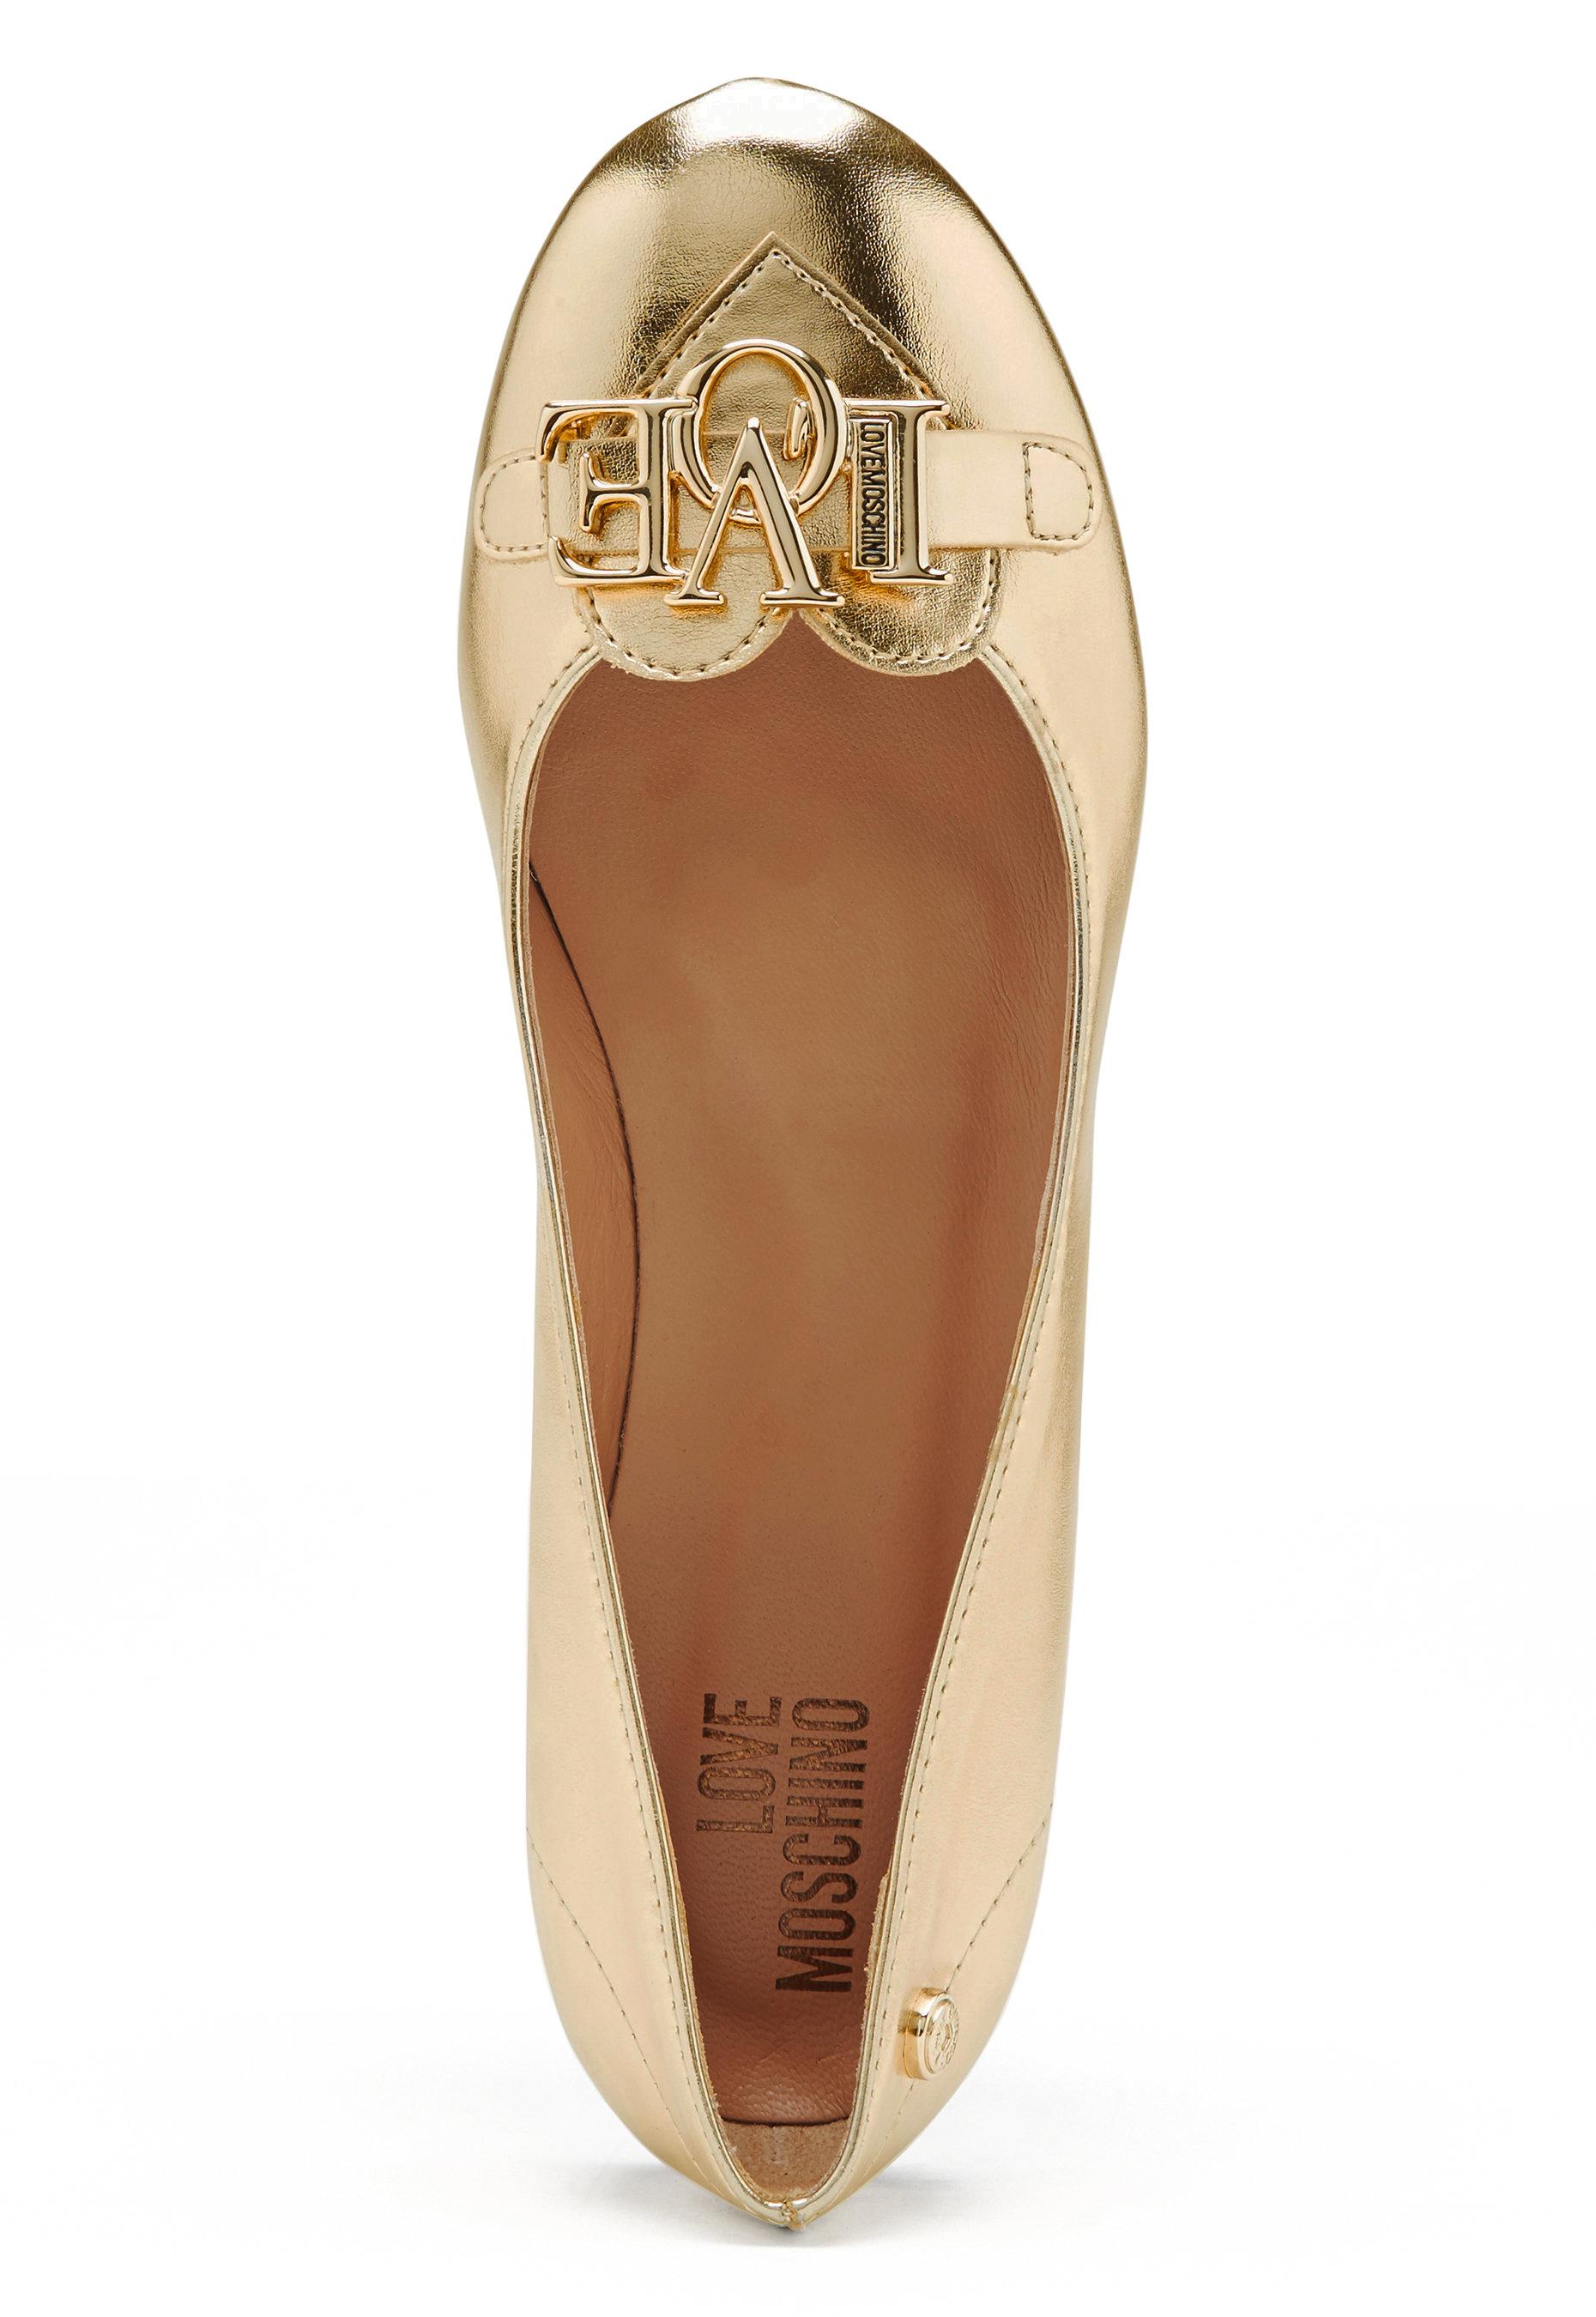 high fashion united states new york Love Moschino Ballerina Shoes 900 Platinum - Bubbleroom